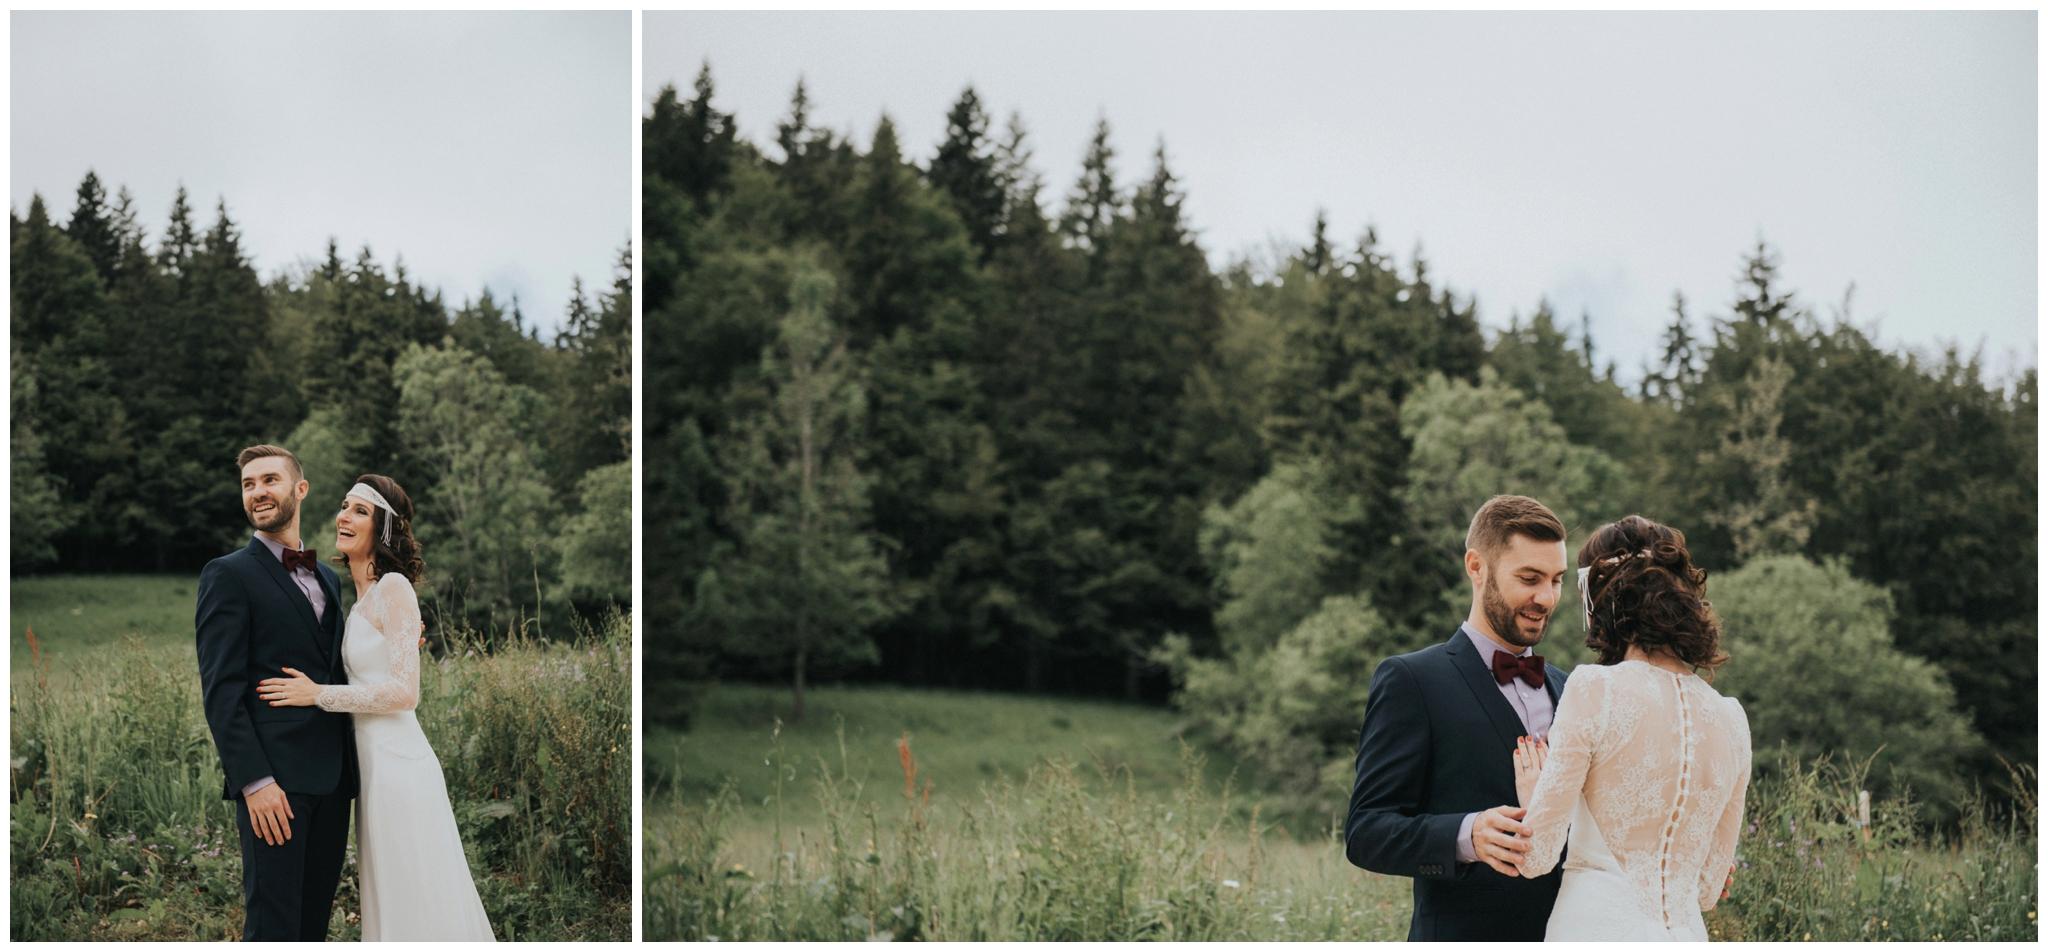 photographe-mariage-montagne-vercors-boho-folk-grenoble-annecy-alpes_0032